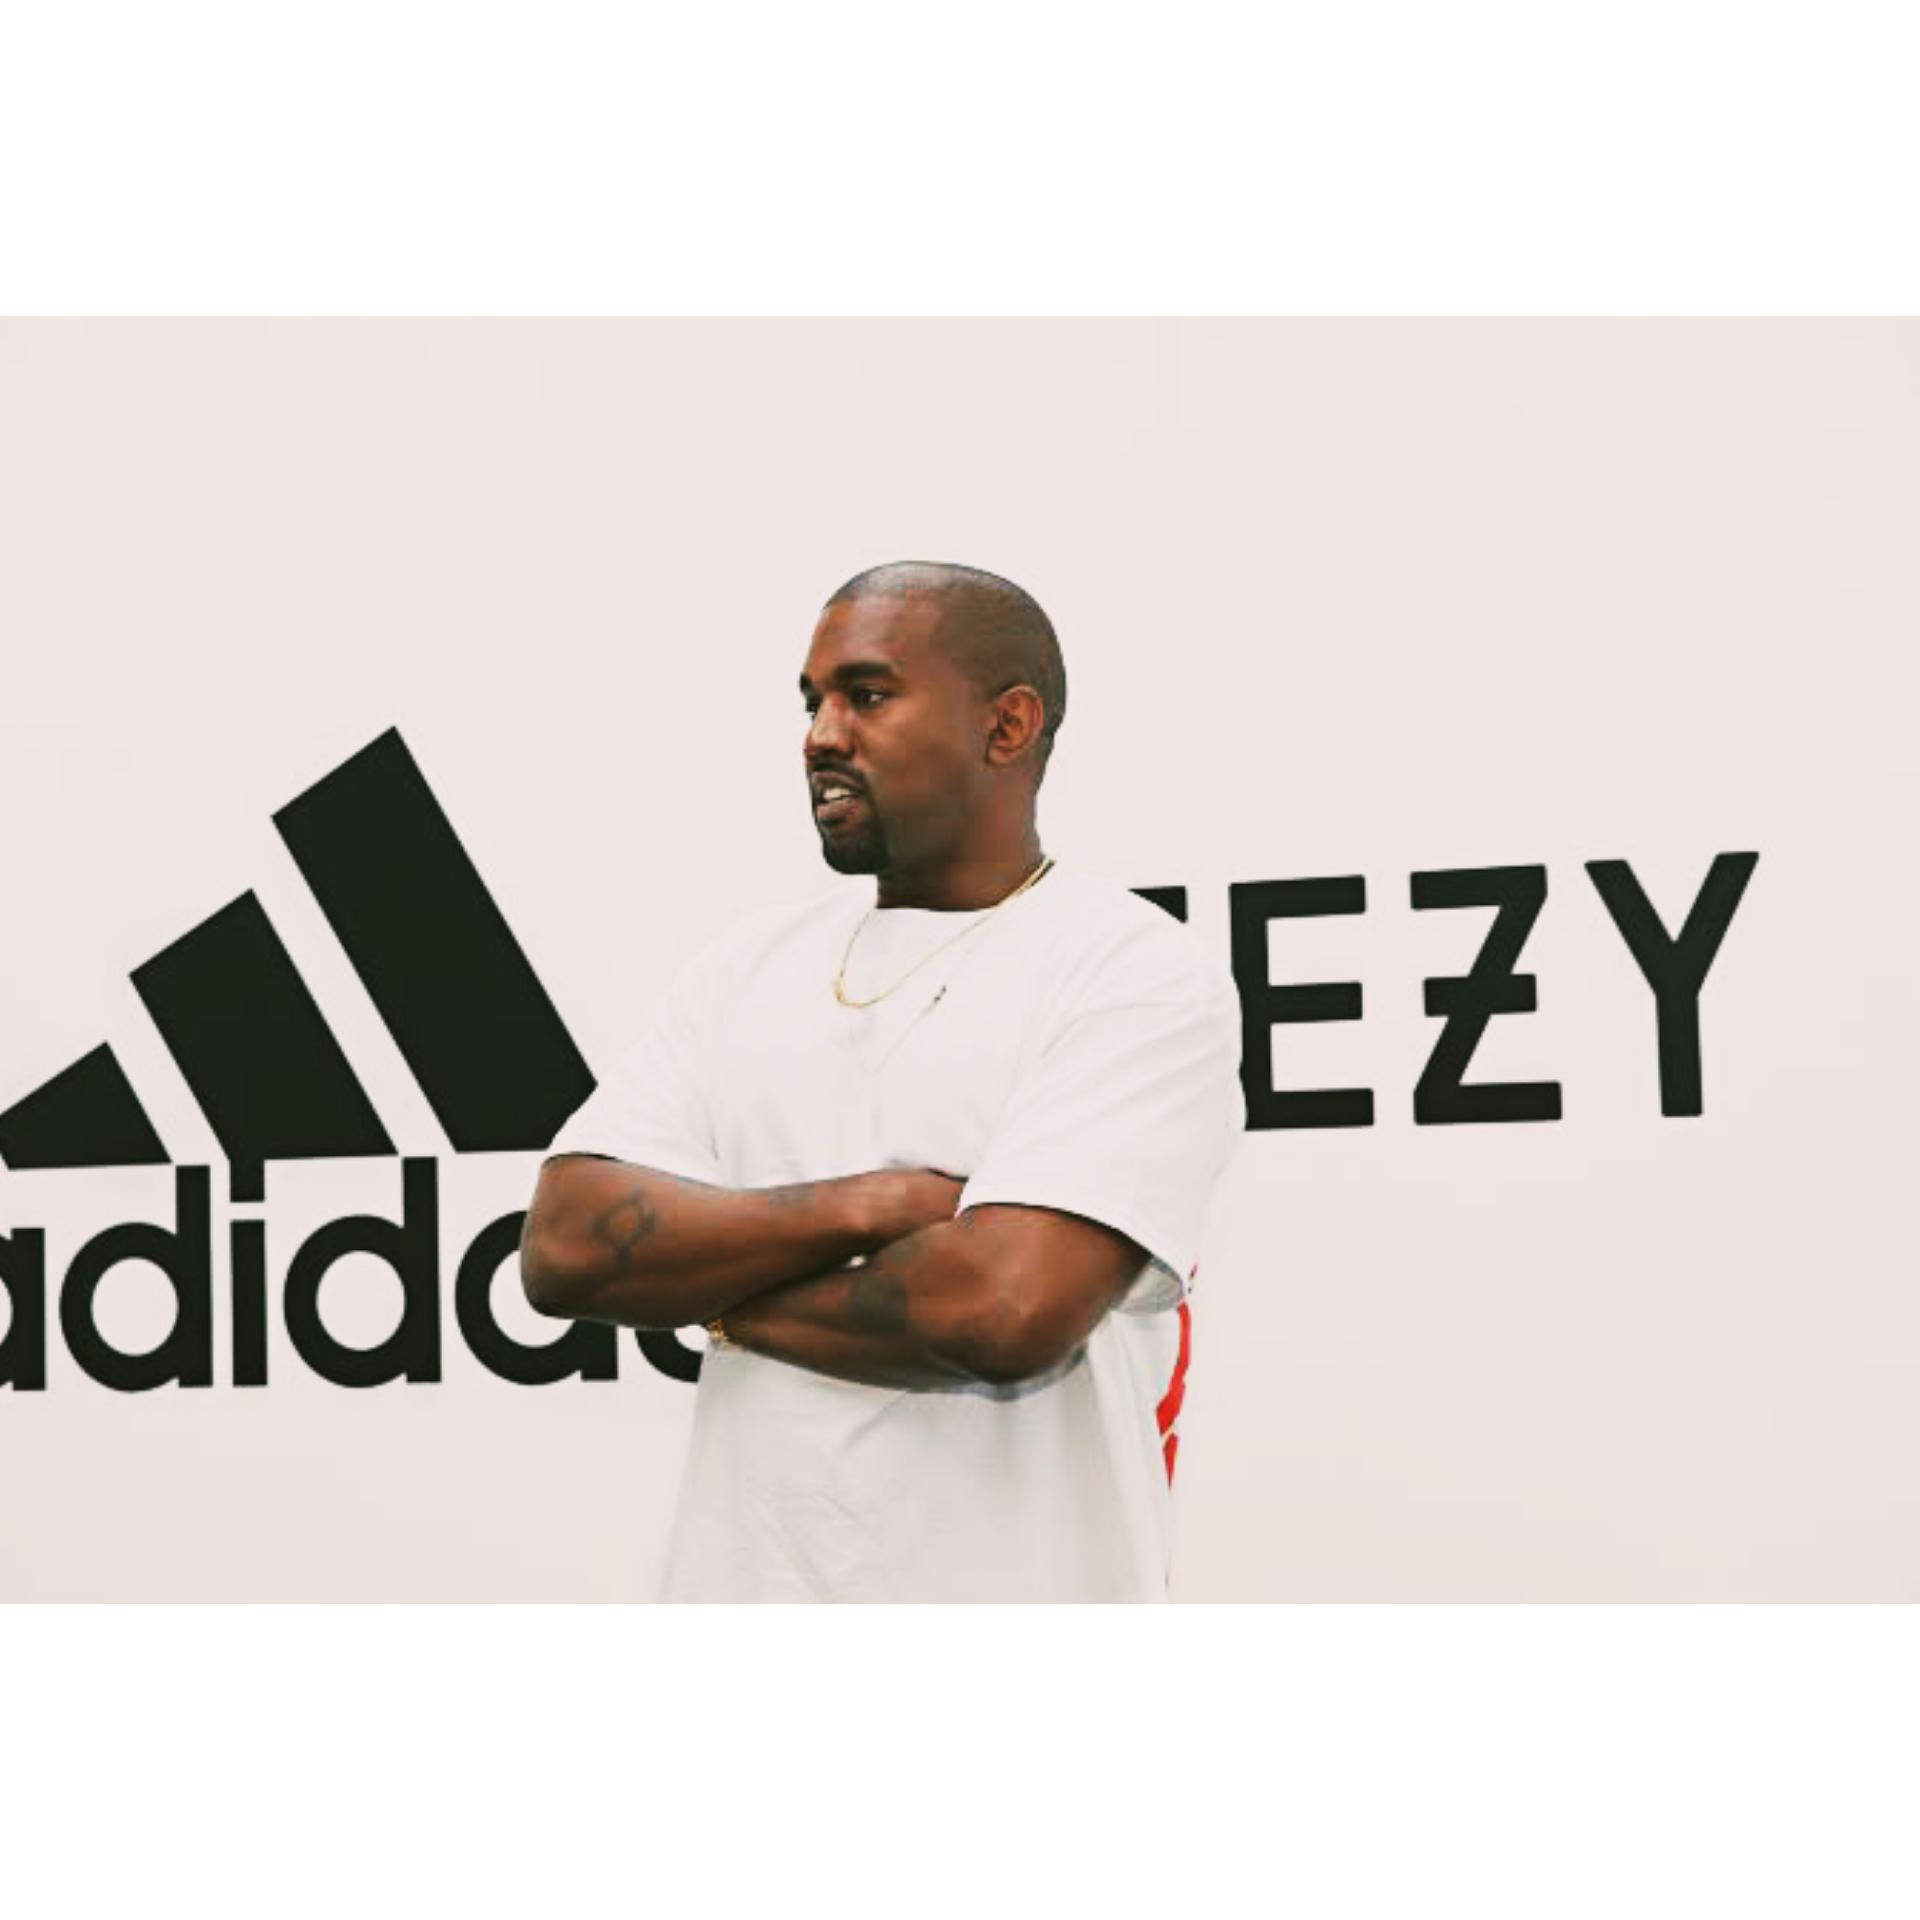 Yeezy Sues Former Intern $500,000